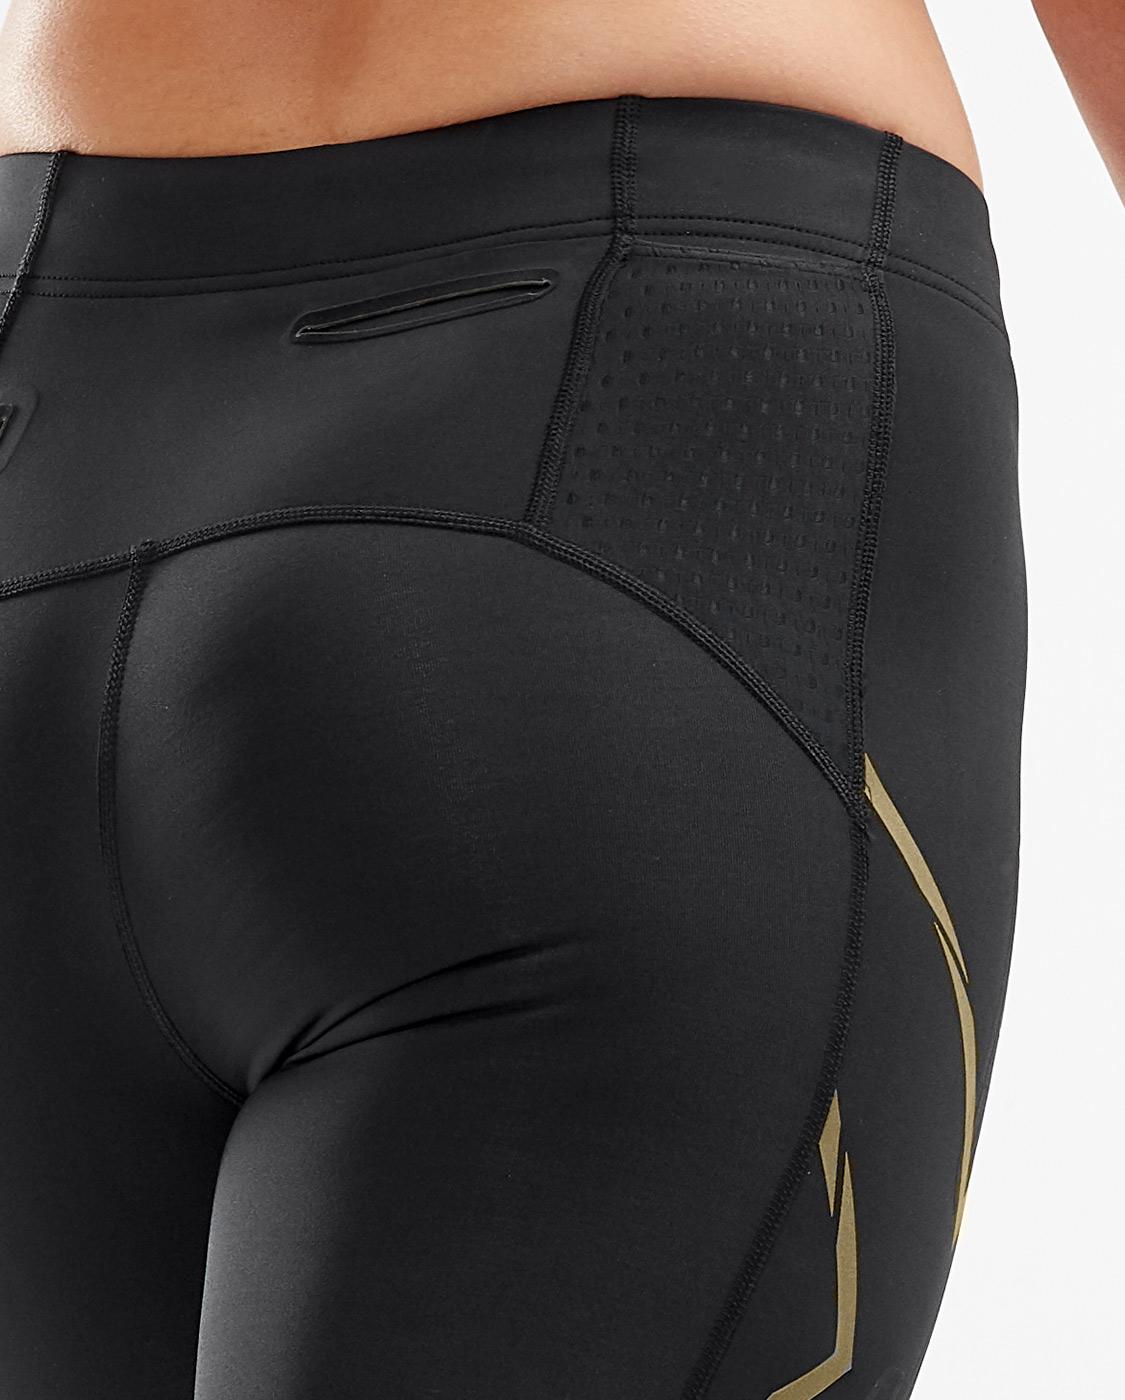 2XU Women's MCS Run Compression 3/4 Tights - Black/Gold Reflective